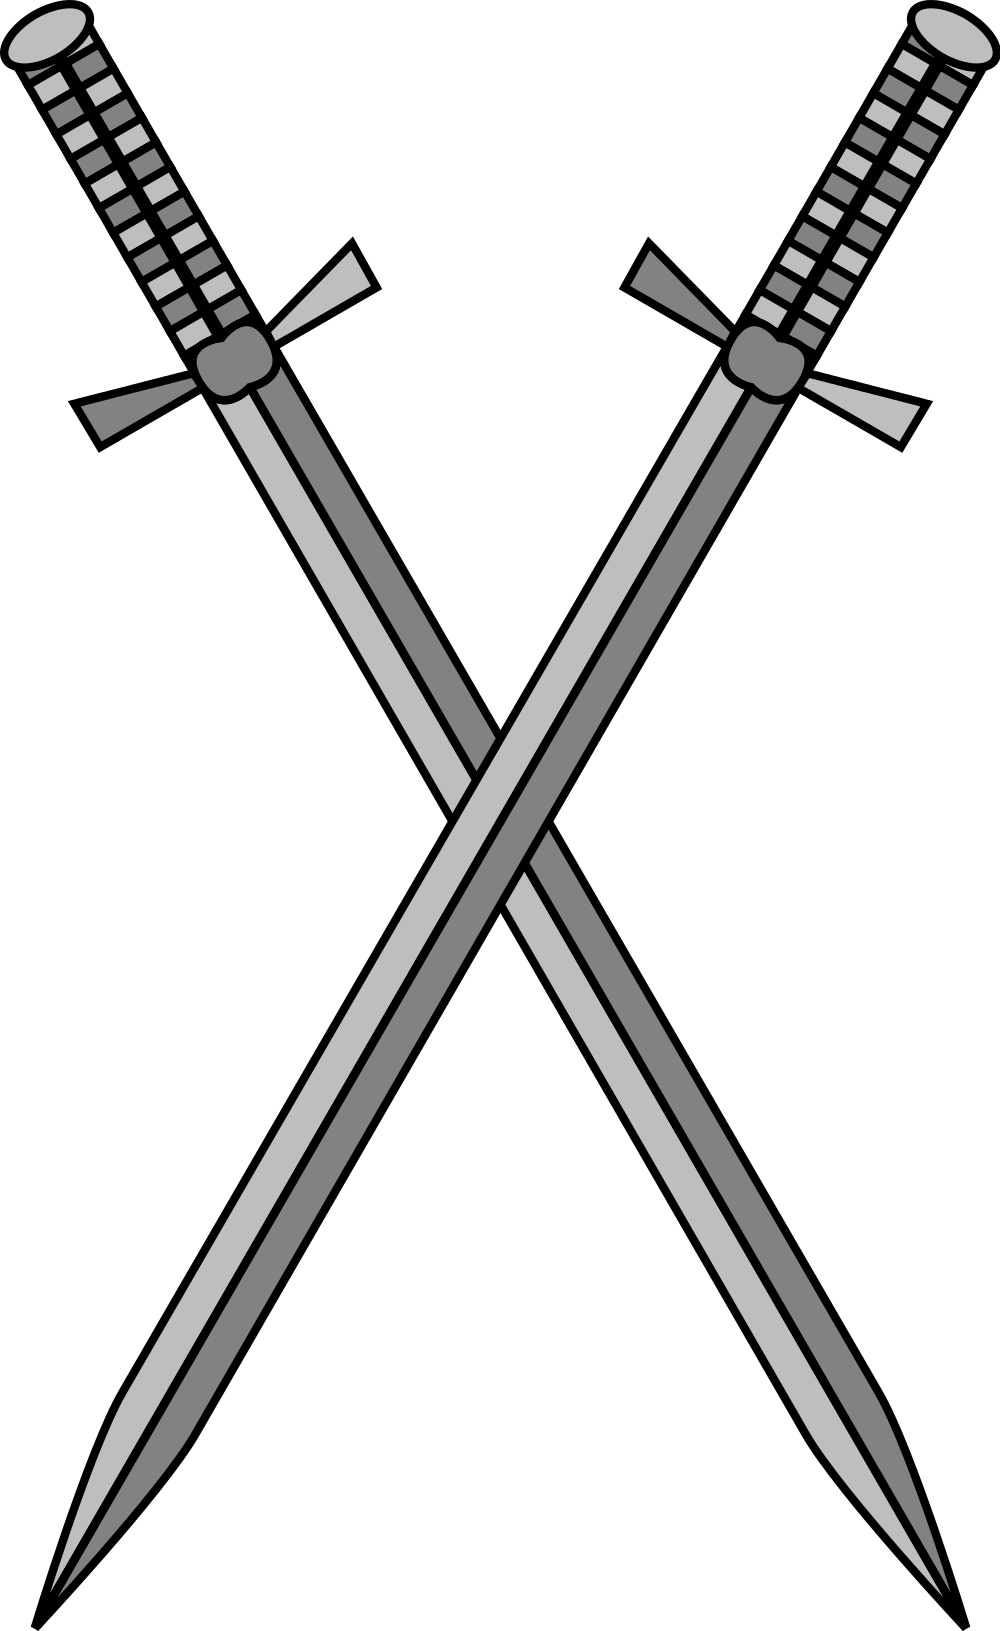 Masonic svg #1, Download drawings